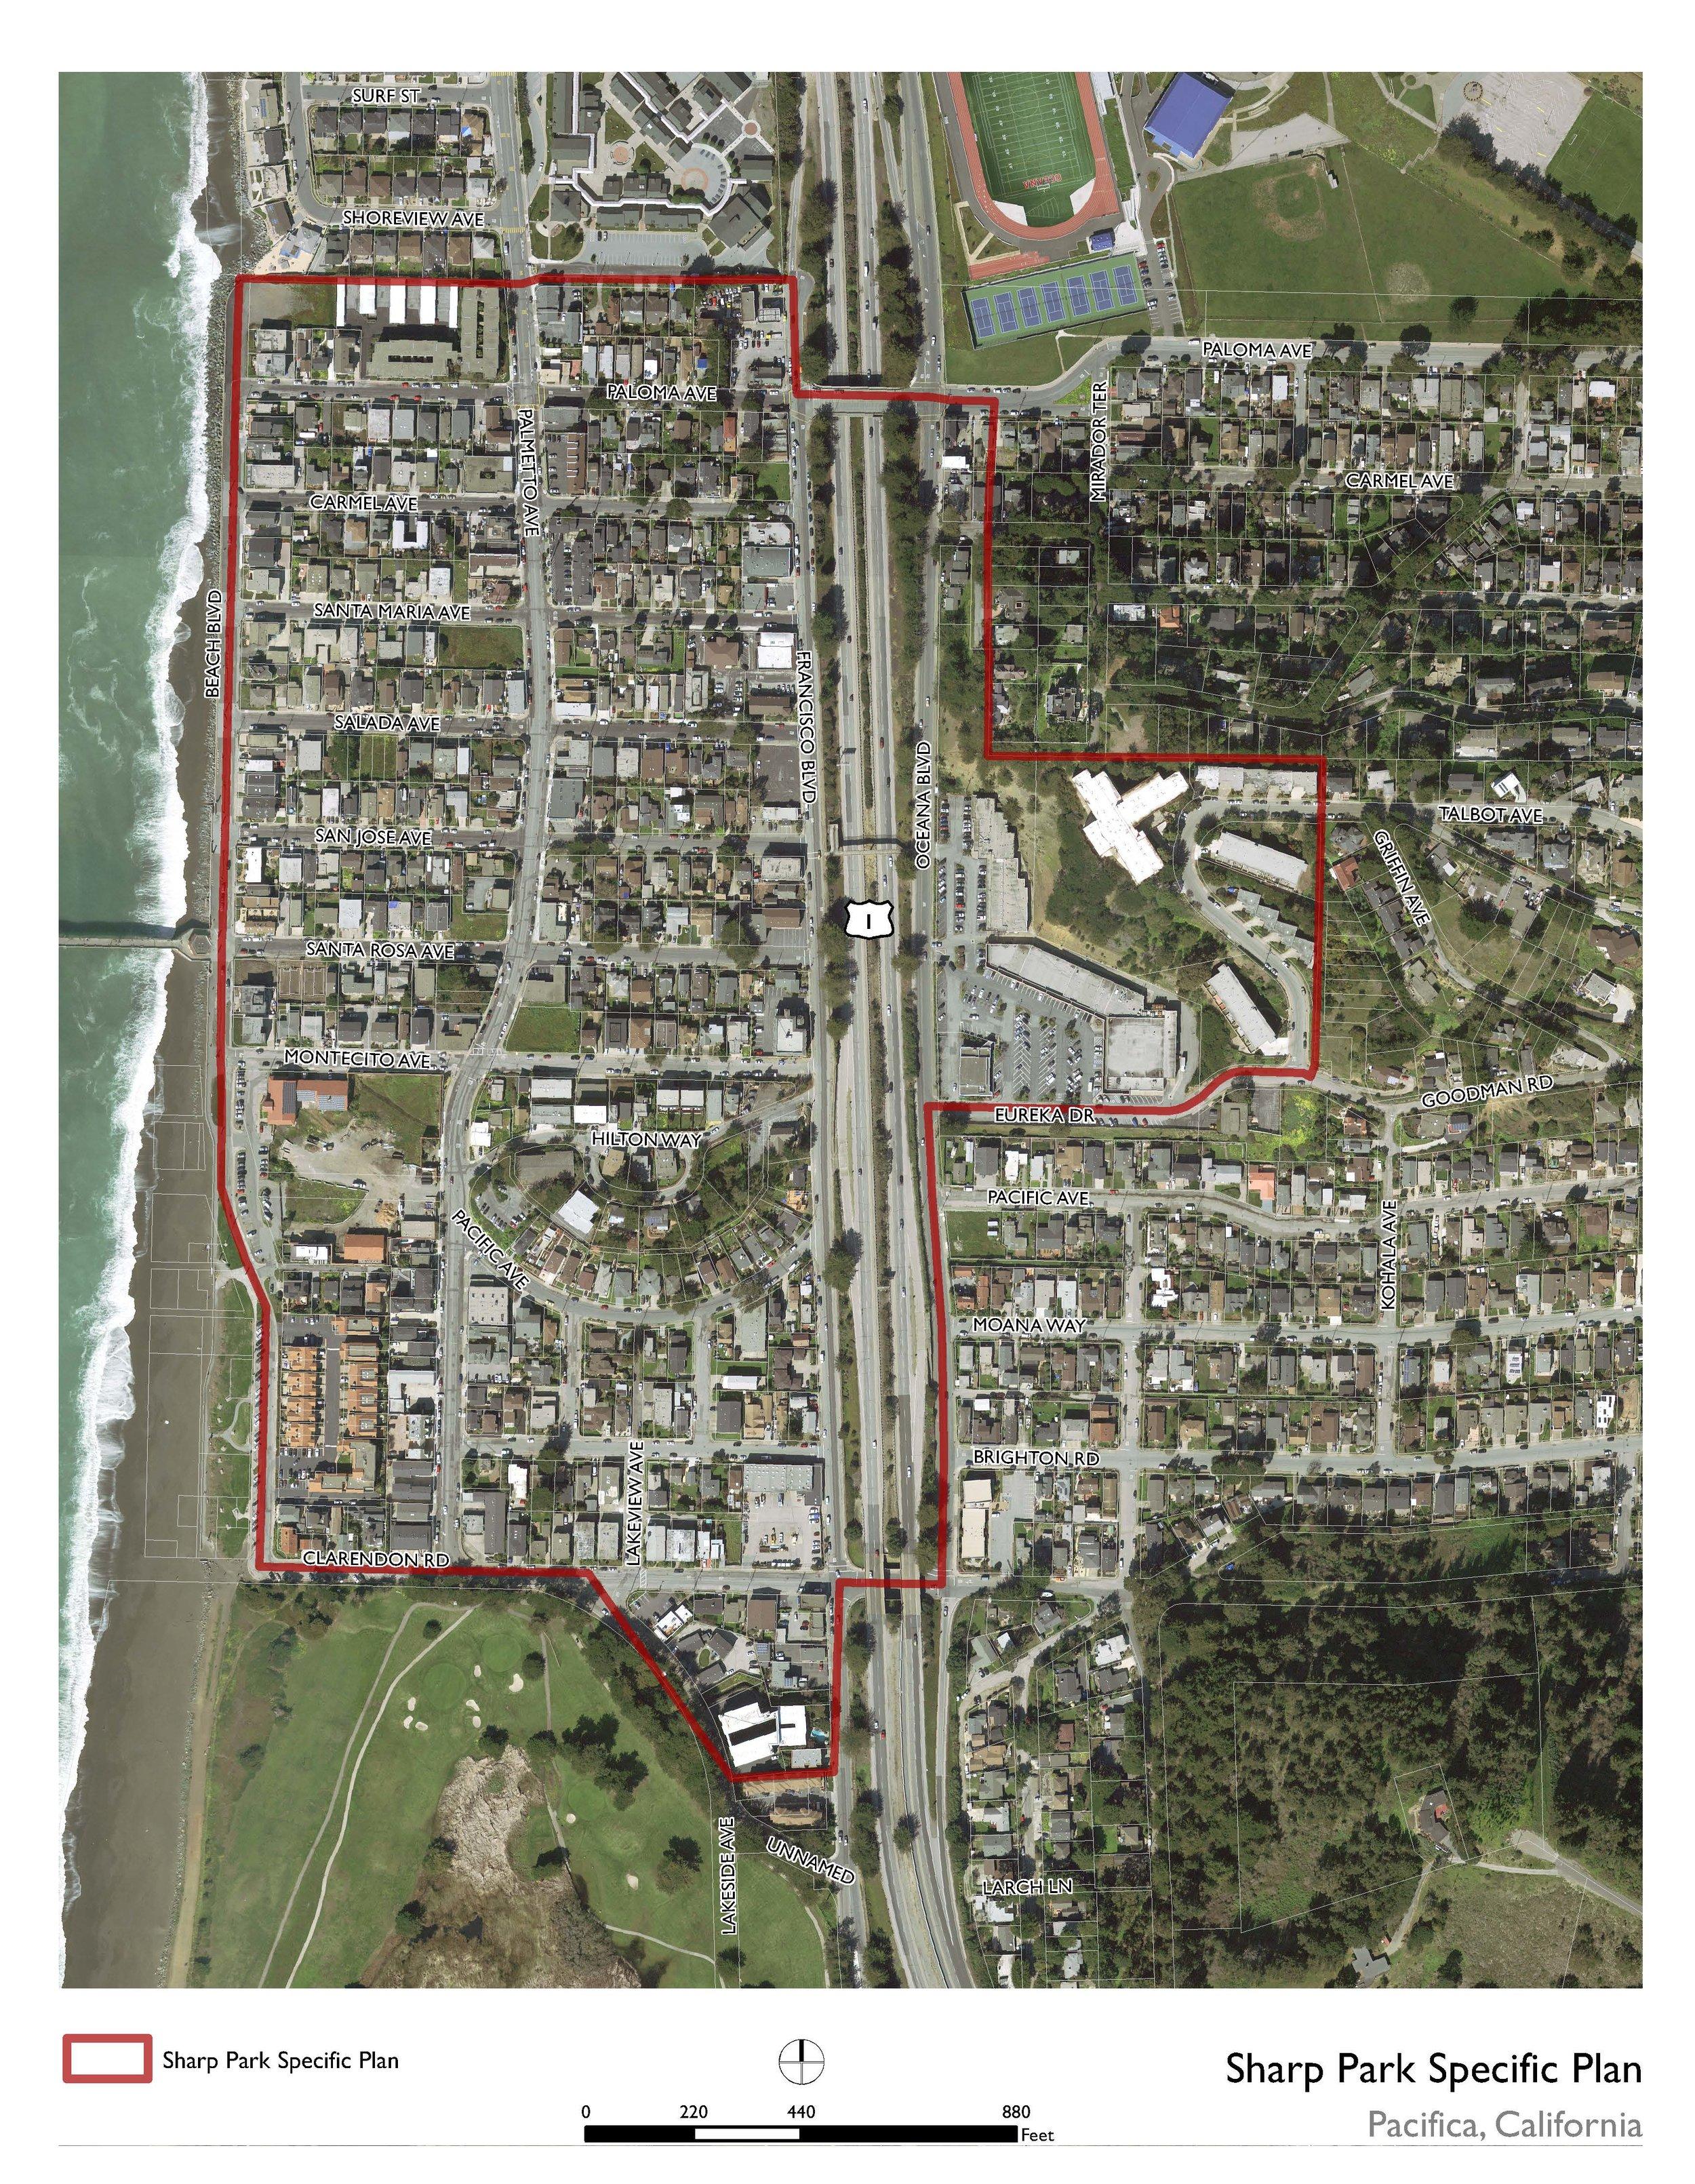 Sharp Park Specific Plan Area Boundary